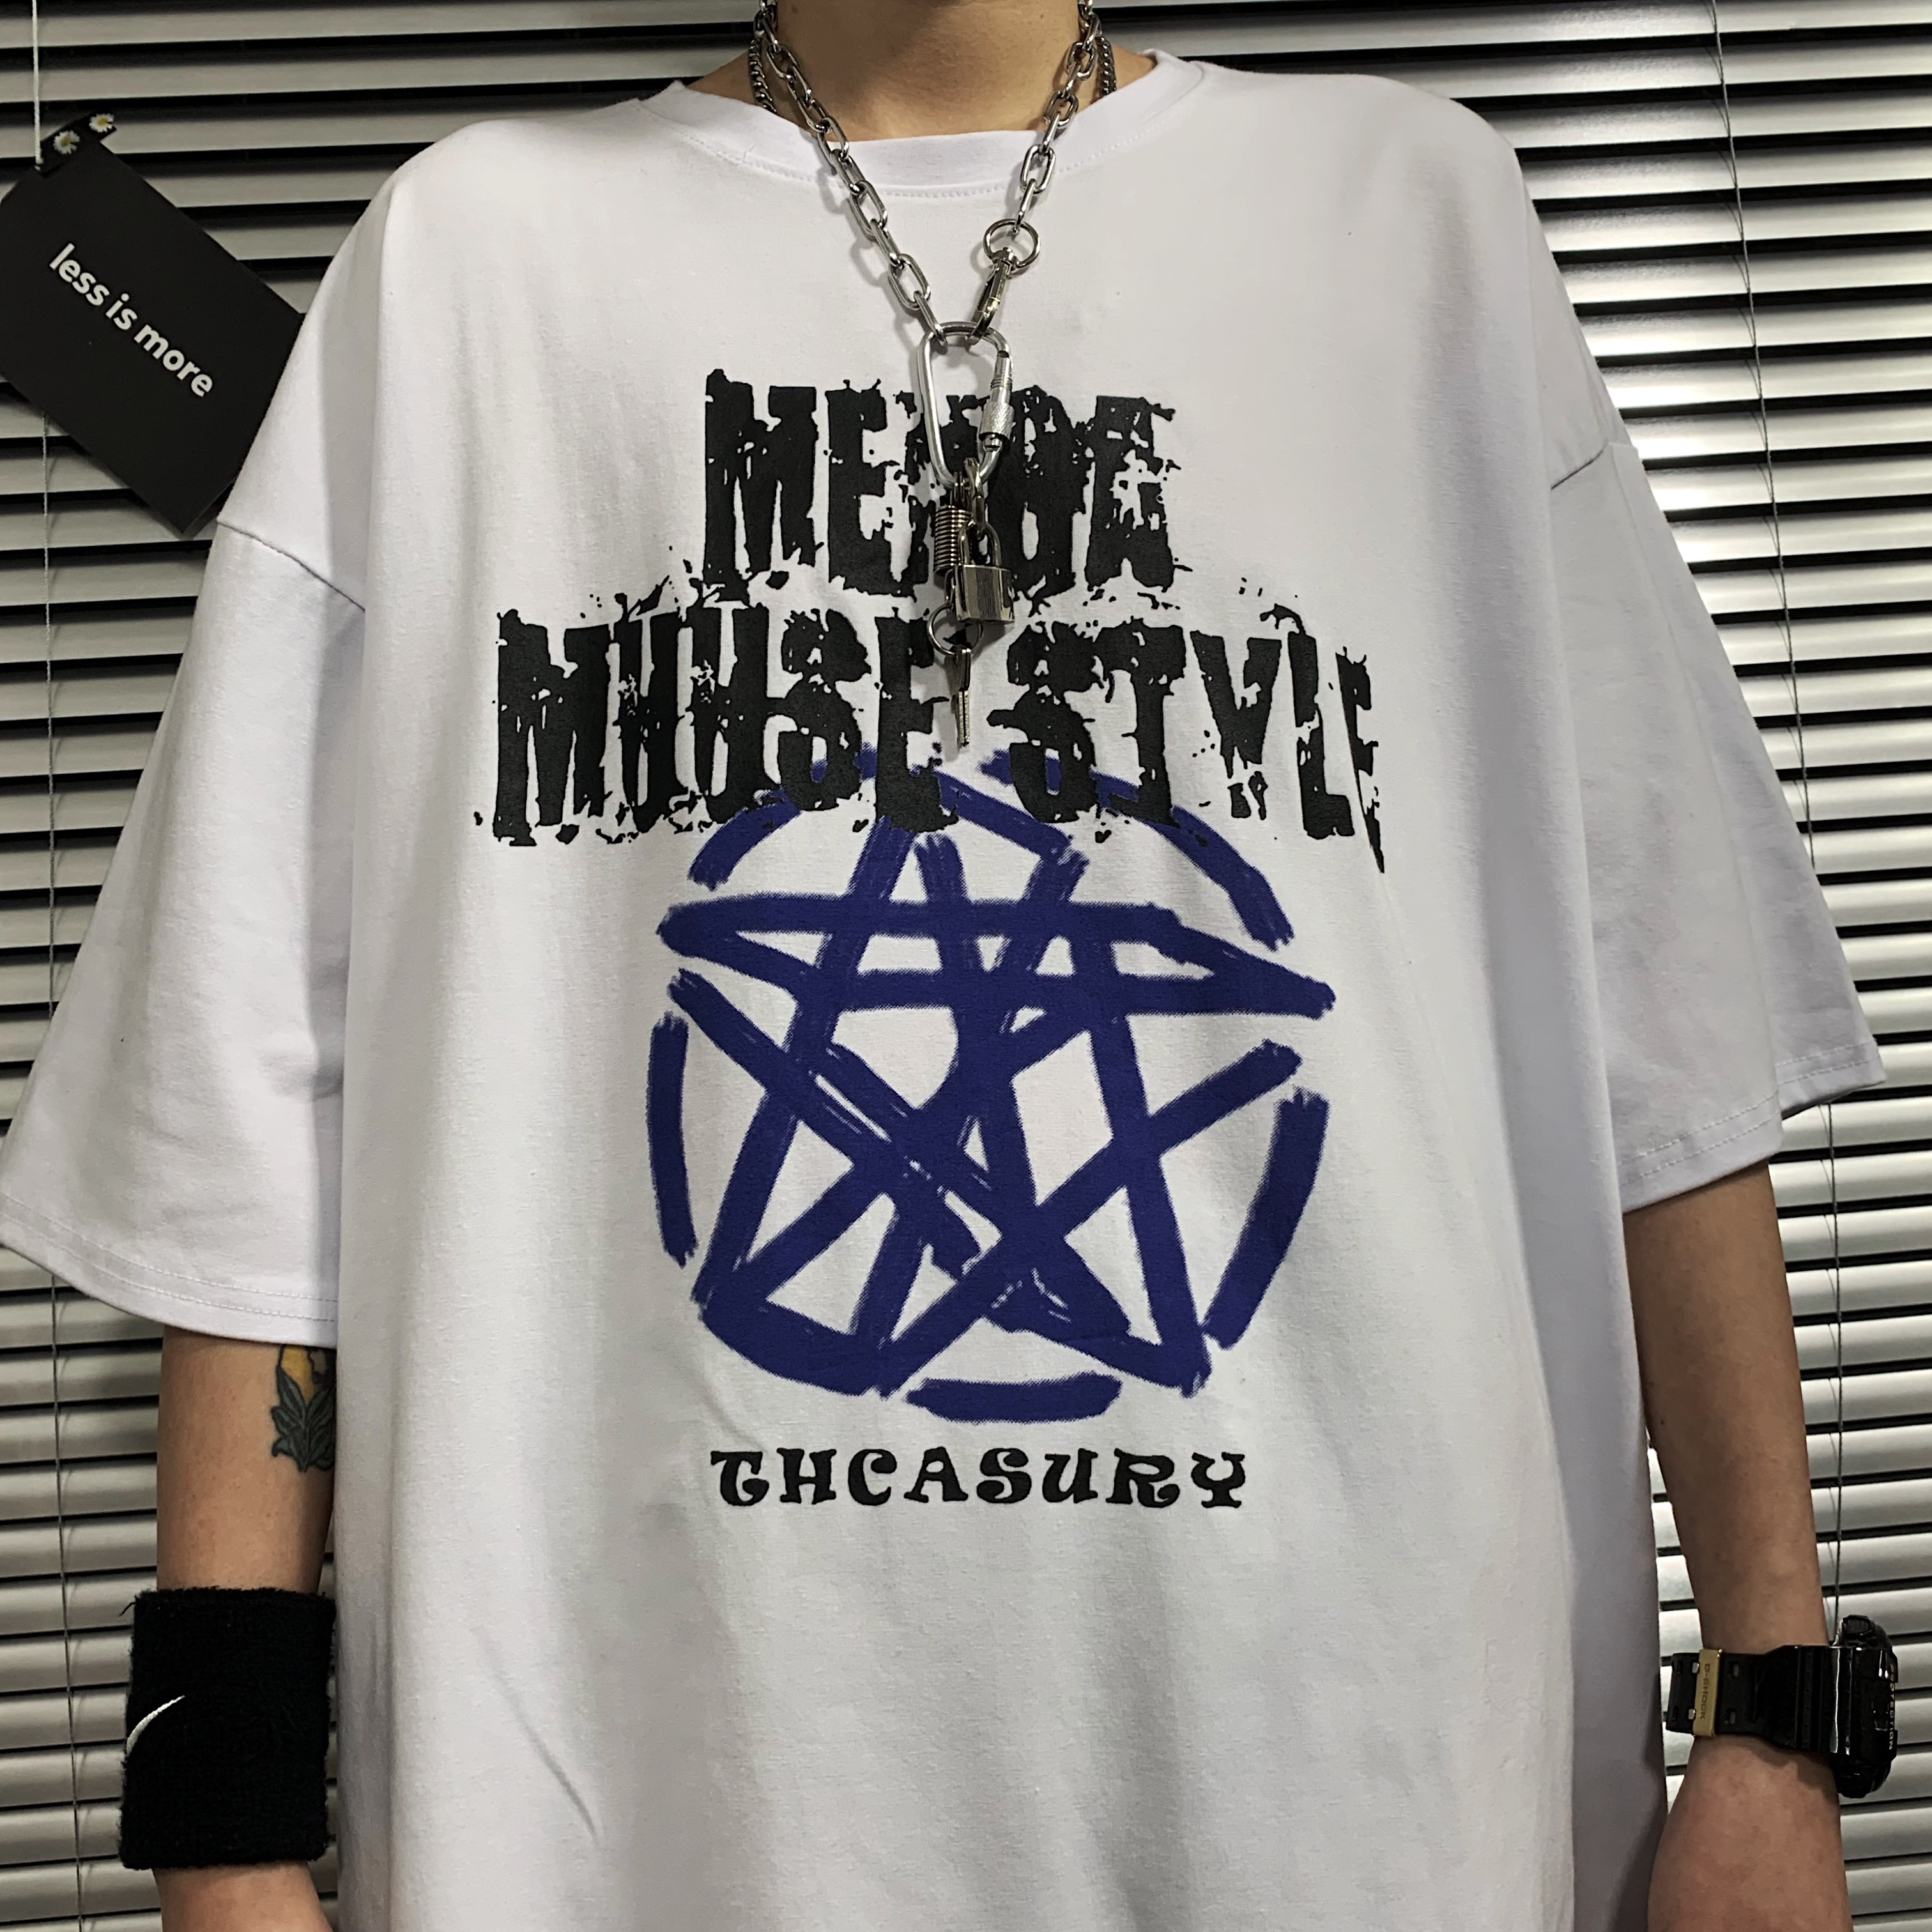 INSstudios 夏季潮流ins暗黑五角星涂鸦做旧字母个性短袖T恤男女